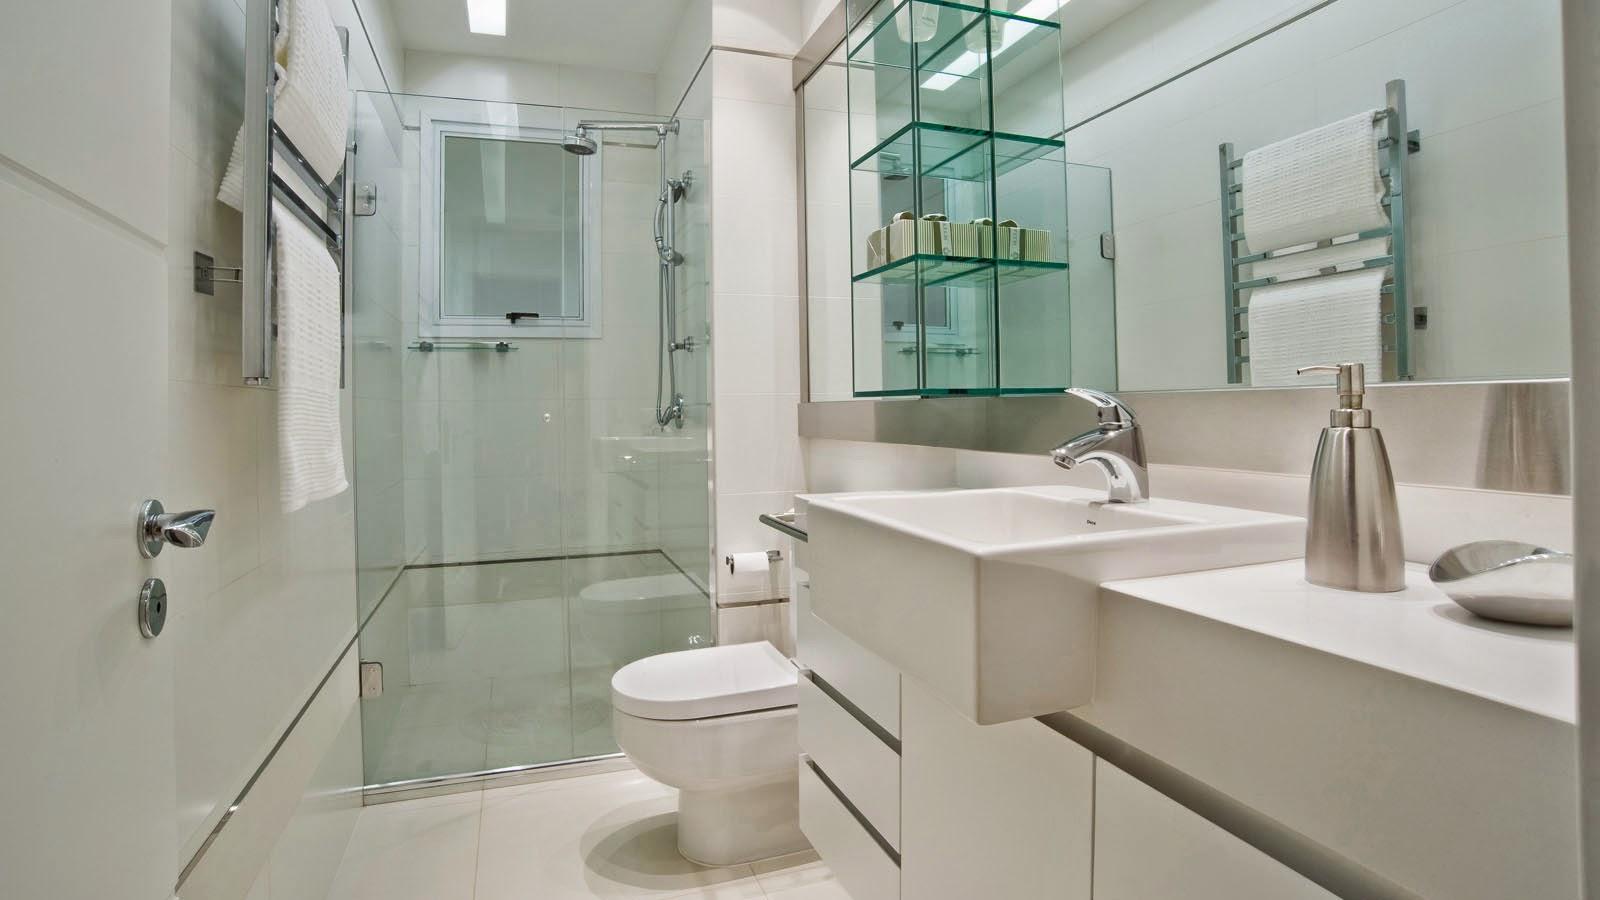 terça feira 26 de agosto de 2014 #476E61 1600x900 Acessórios Para Banheiro De Vidro